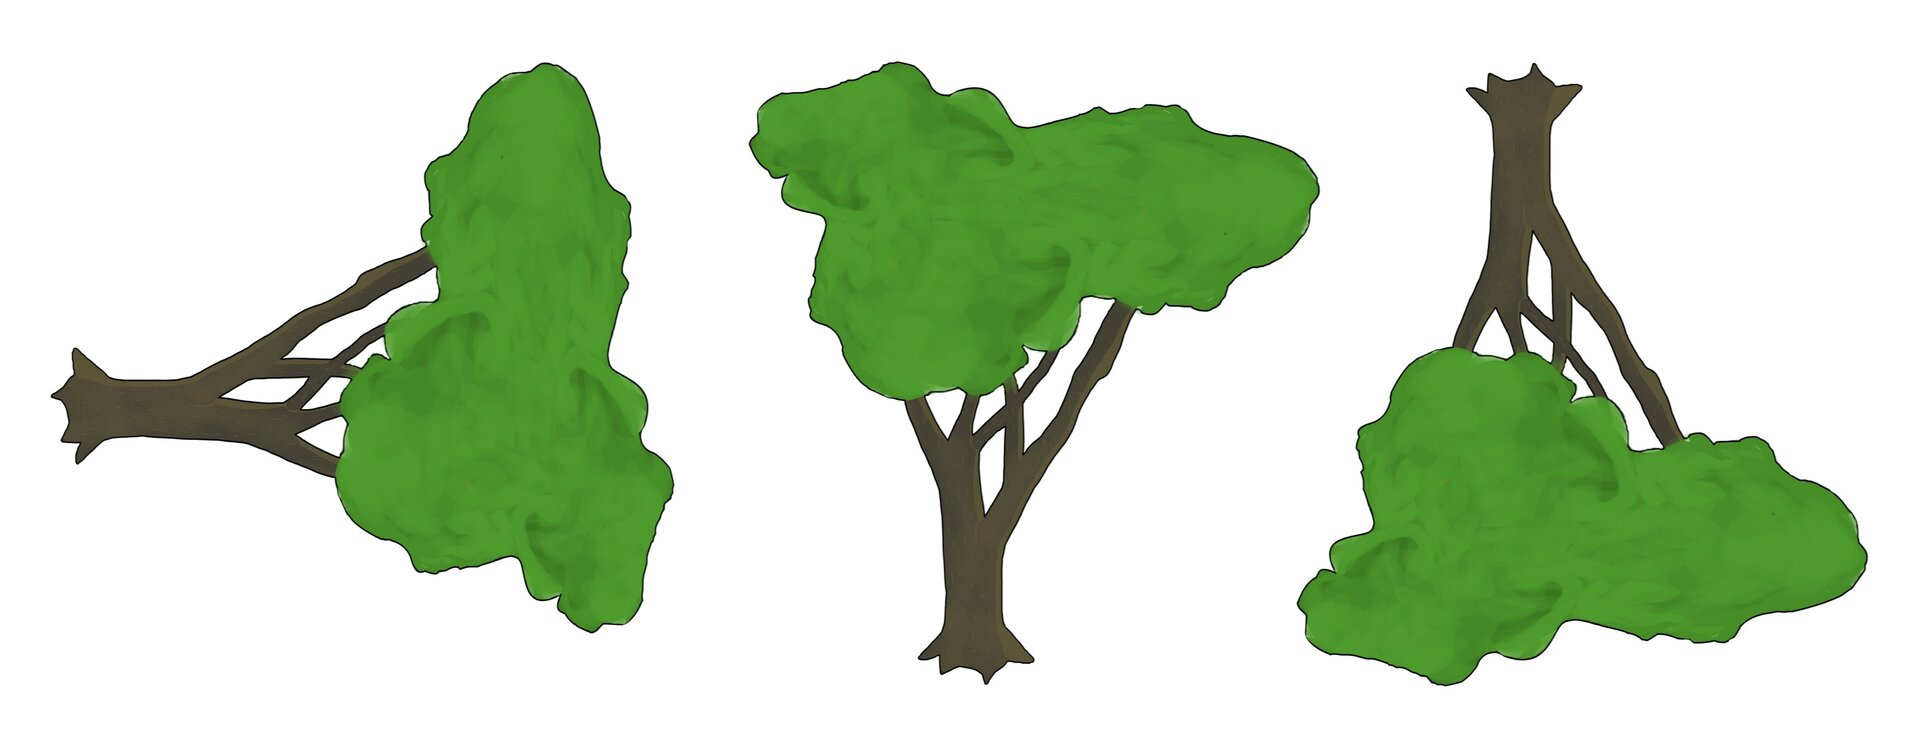 Rysunek dwóch drzew.